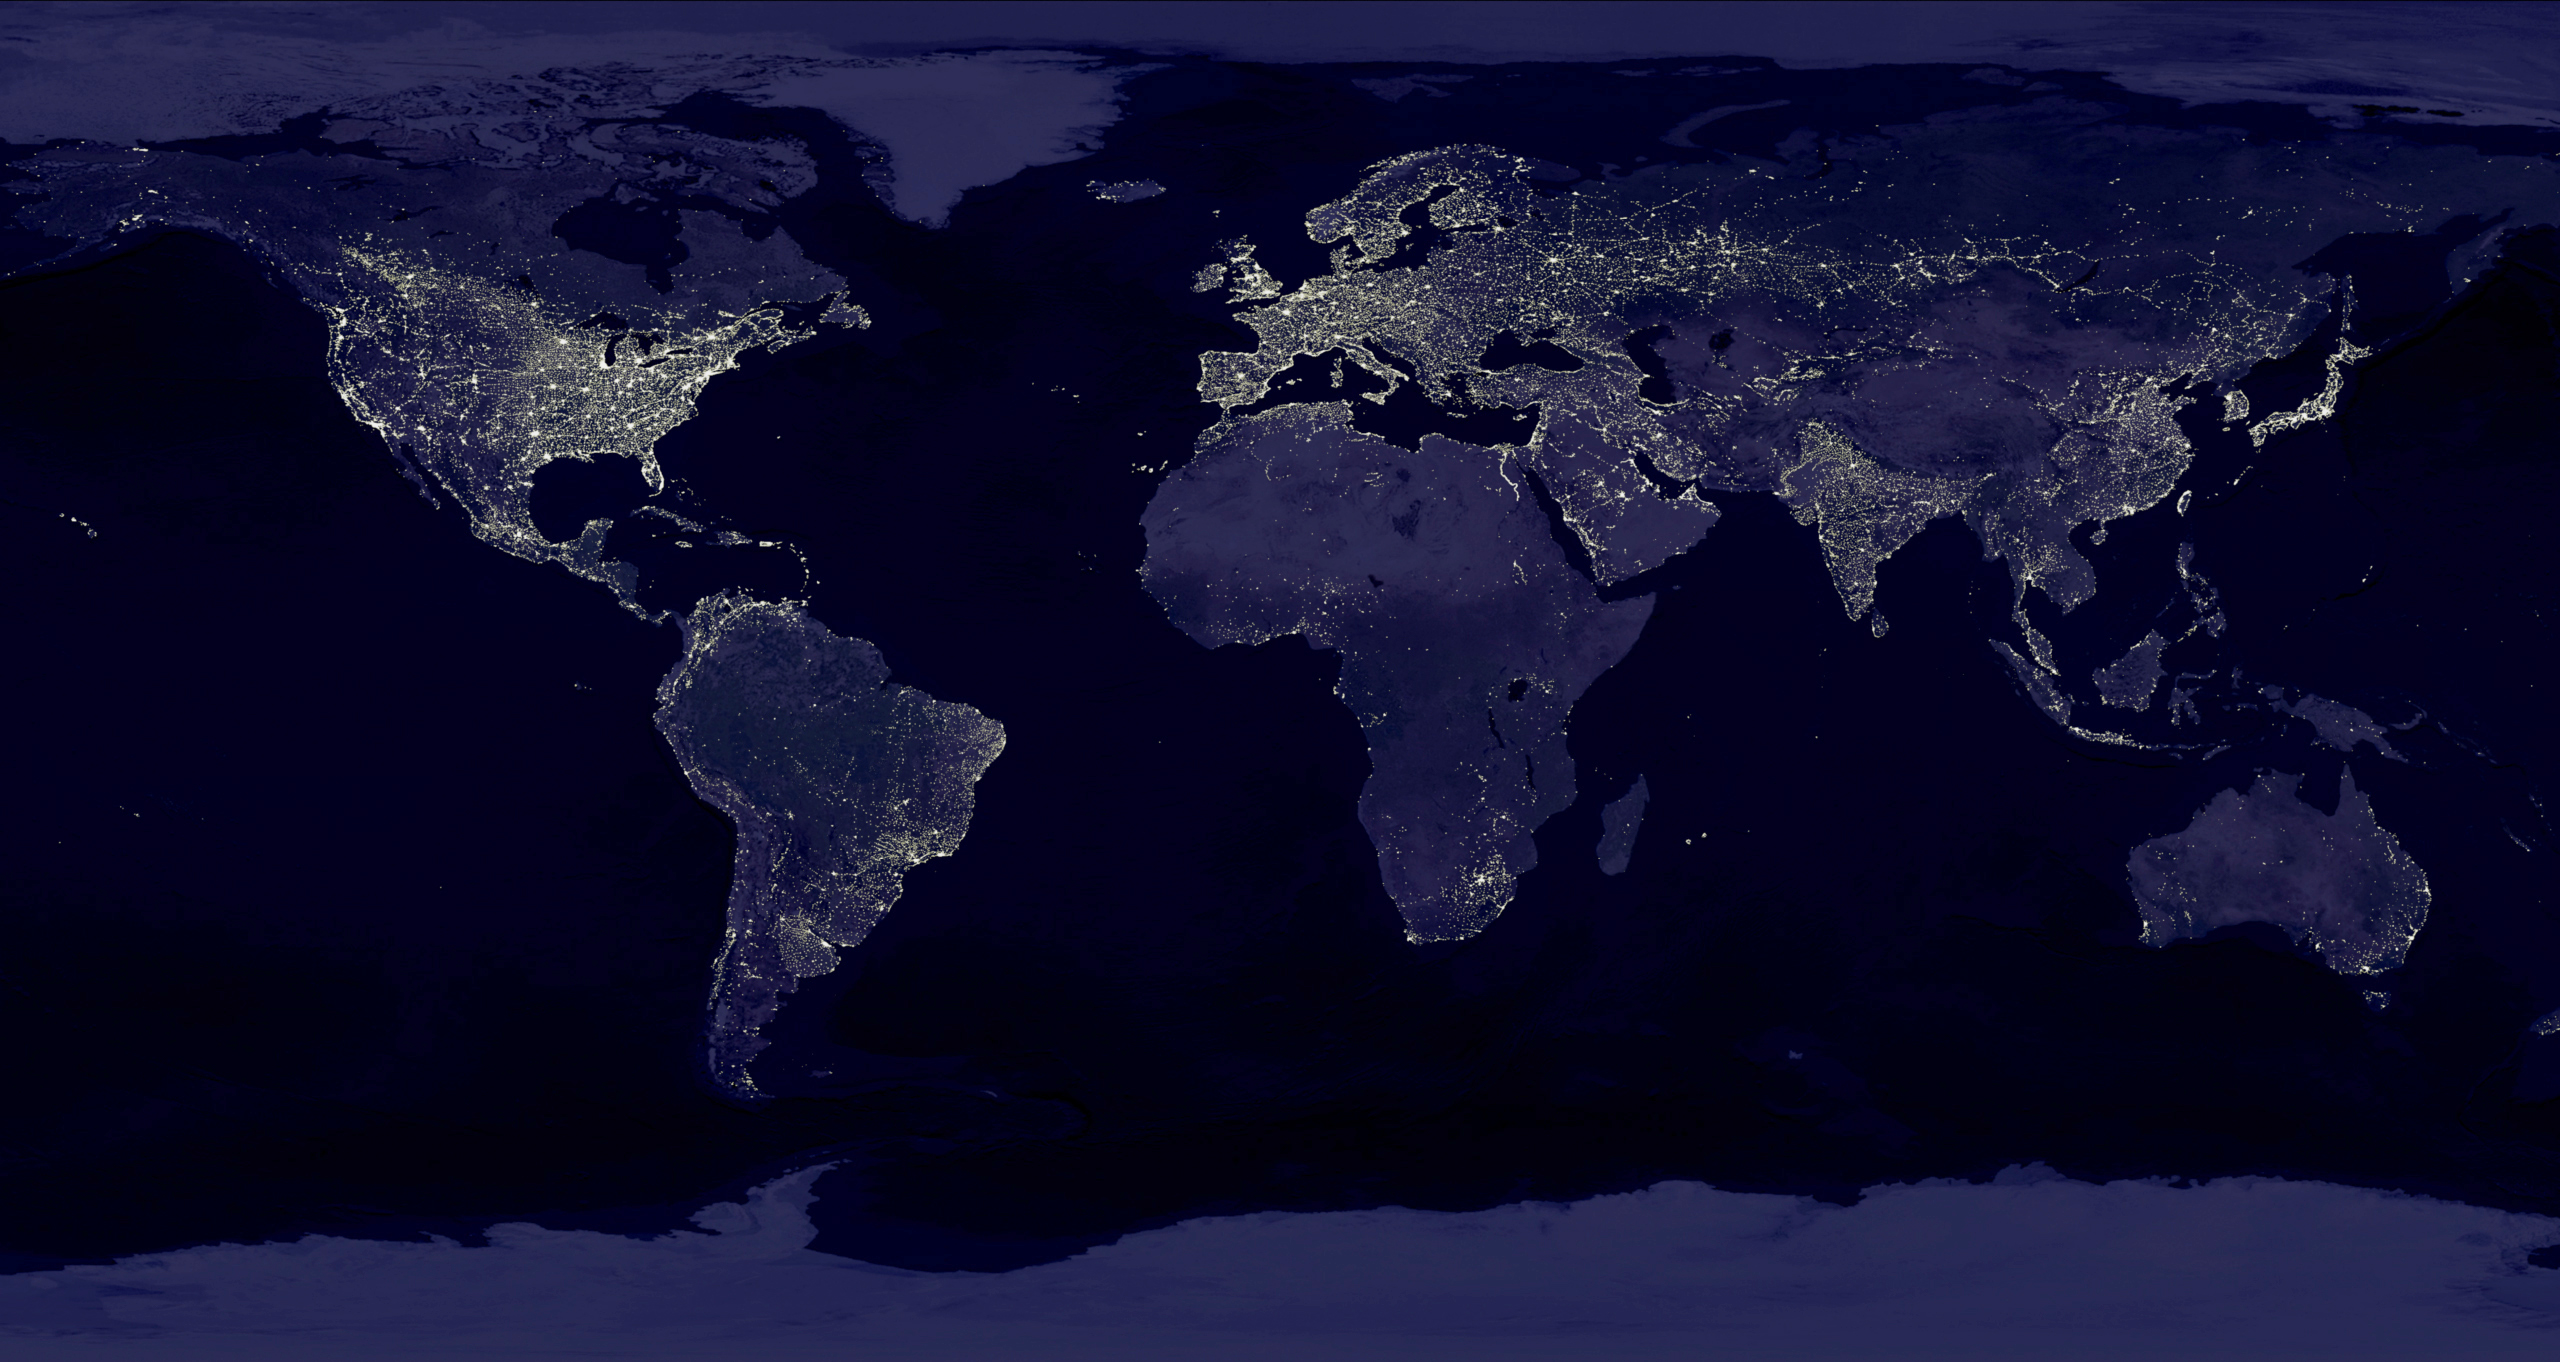 MA in Remote Sensing & Geospatial Sciences » Earth & Environment